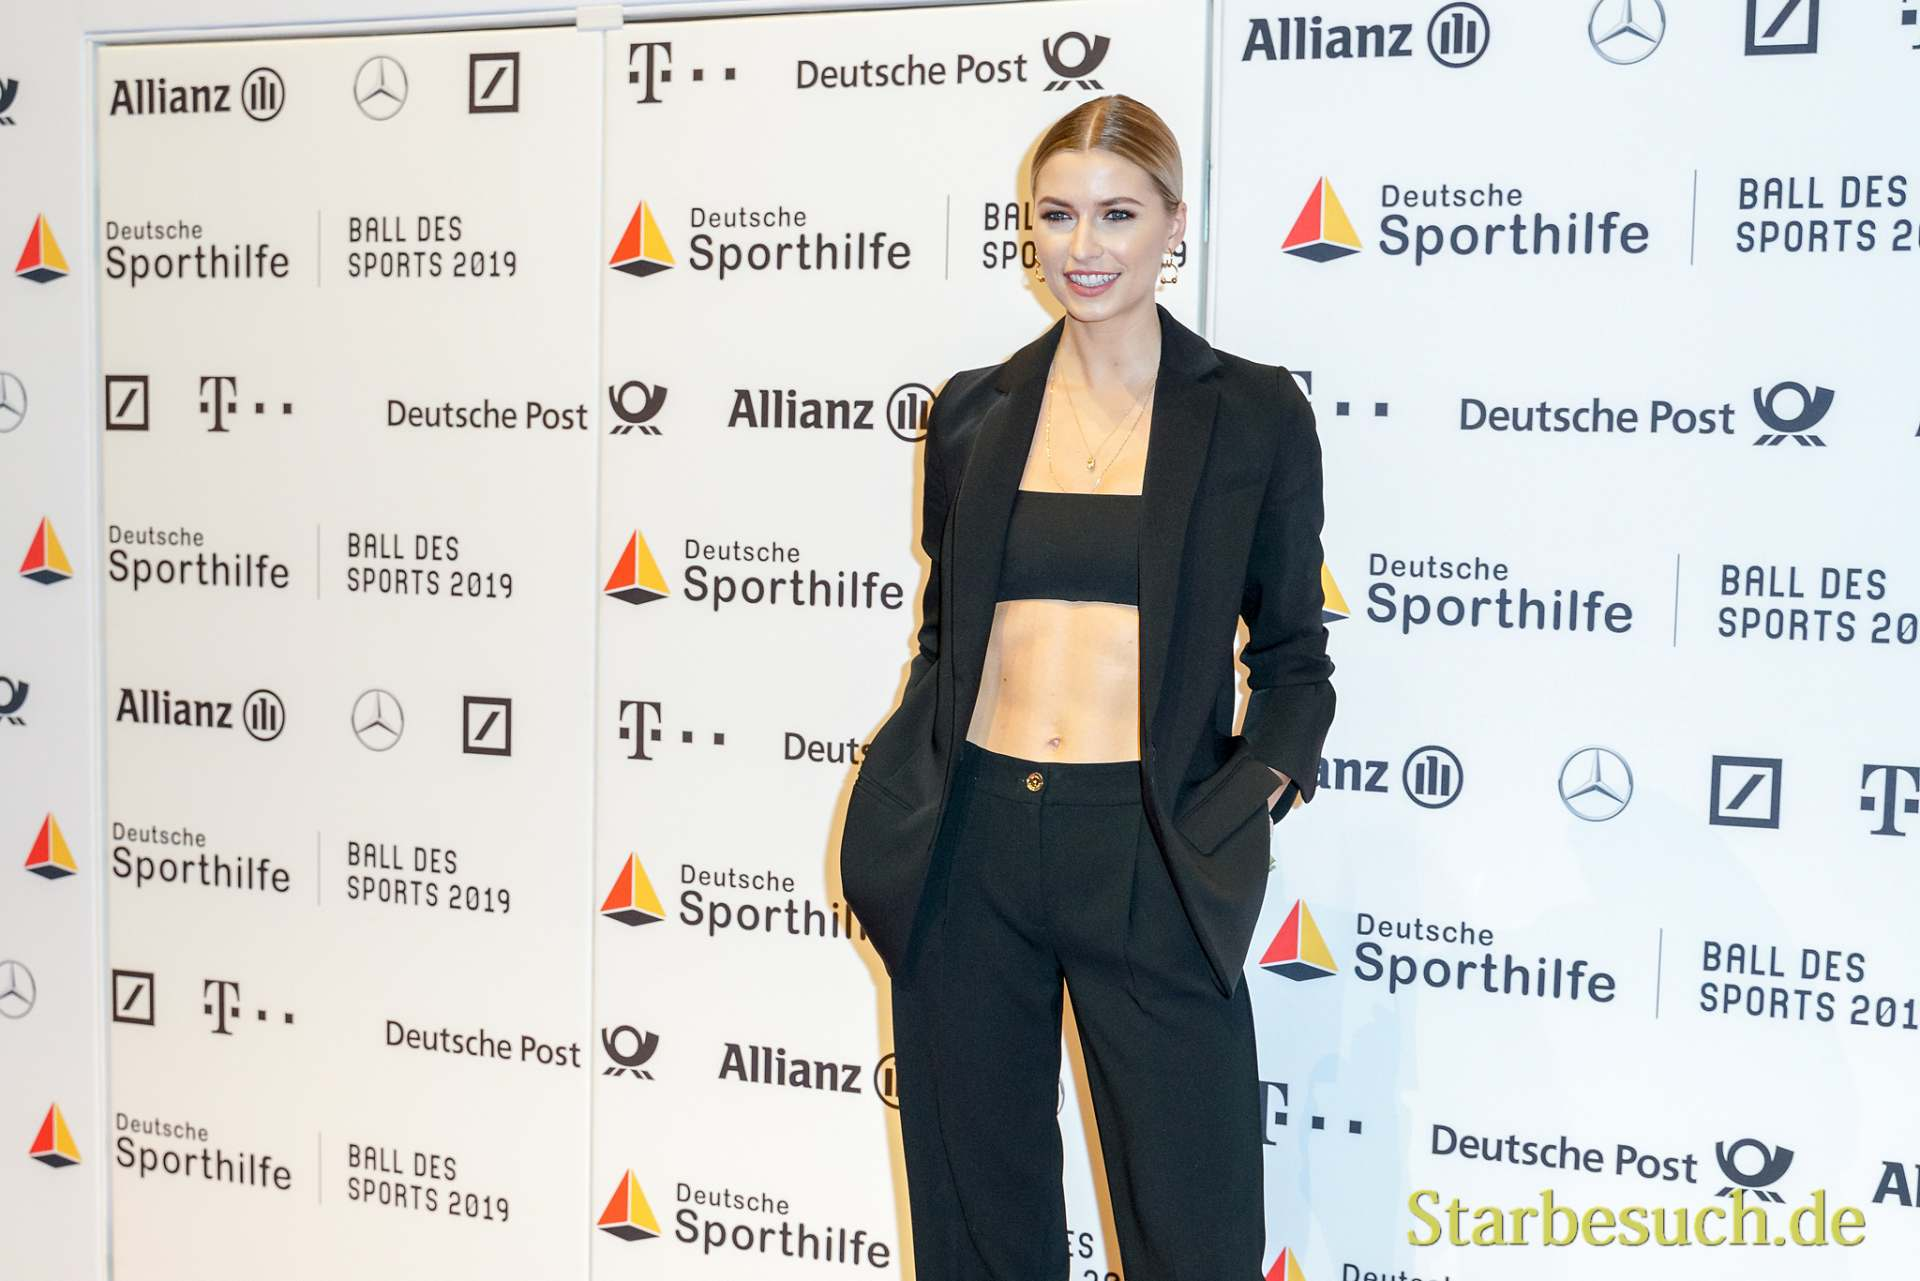 WIESBADEN, Germany - February 2nd, 2019: Lena Gercke (*1988, German model) at Ball des Sports 2019